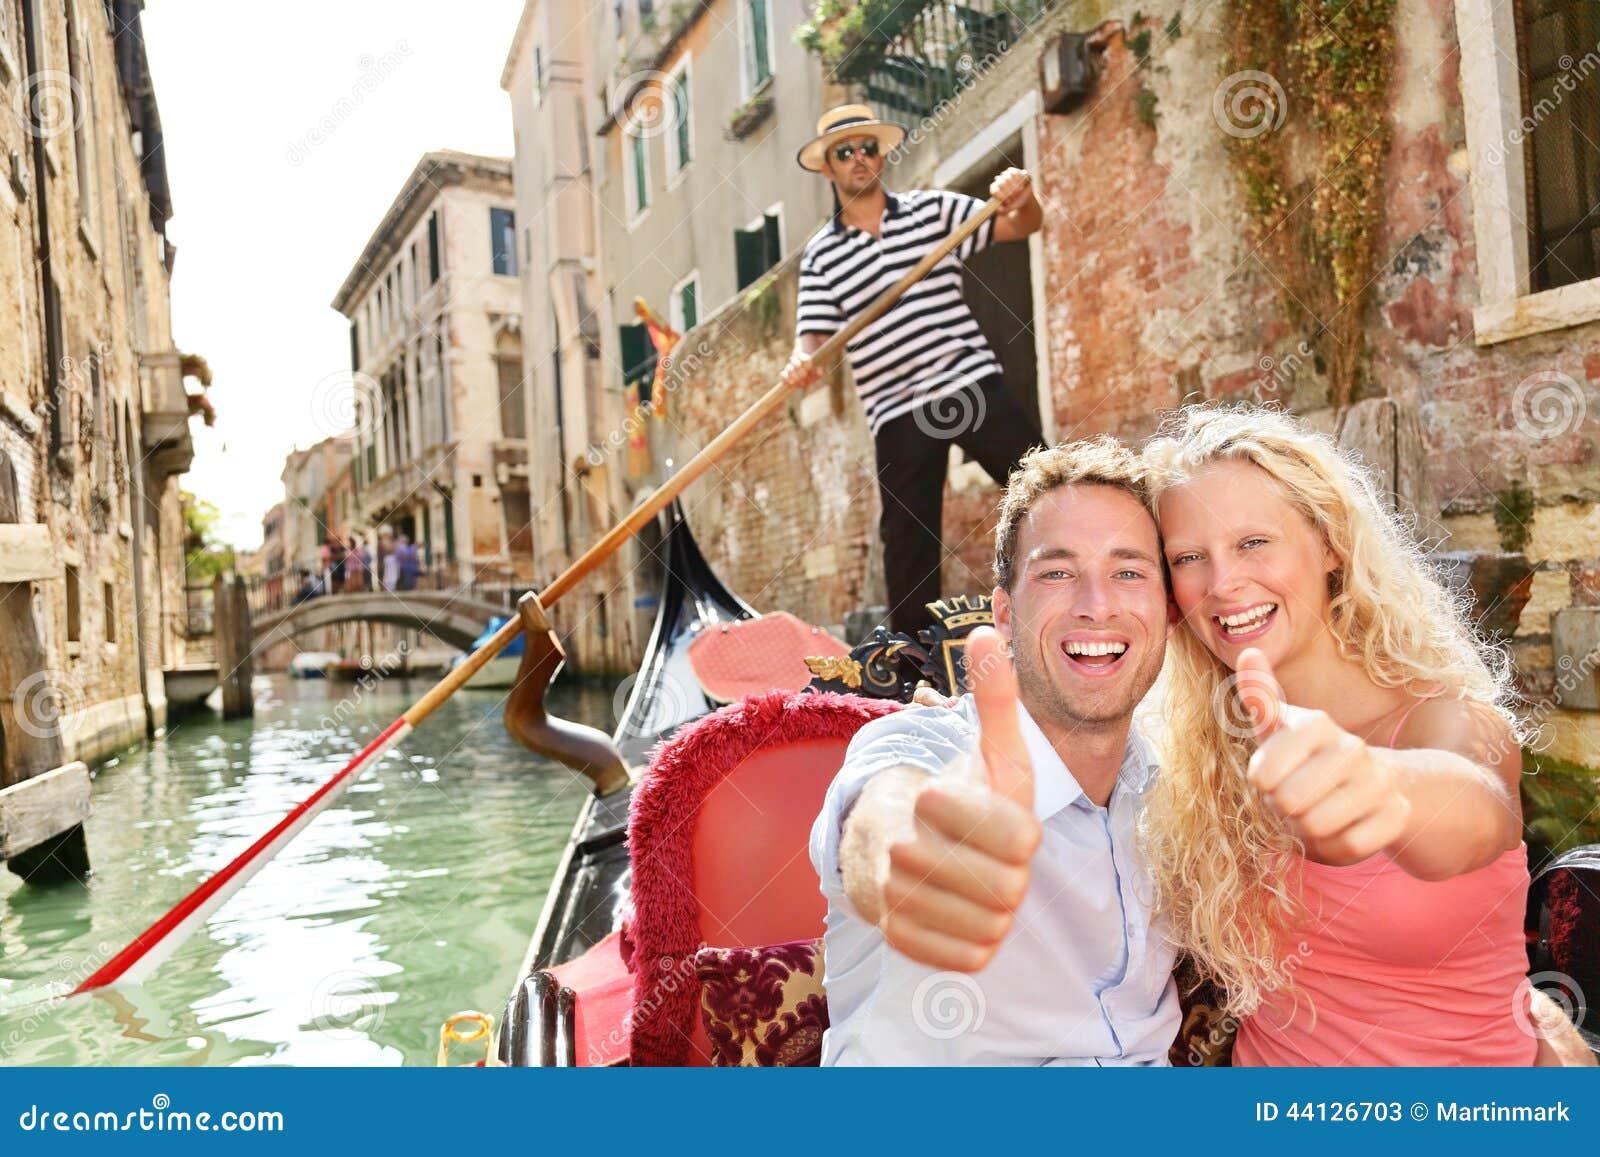 Download Travel Concept - Happy Couple In Venice Gondola Stock Image - Image of boyfriend, ride: 44126703